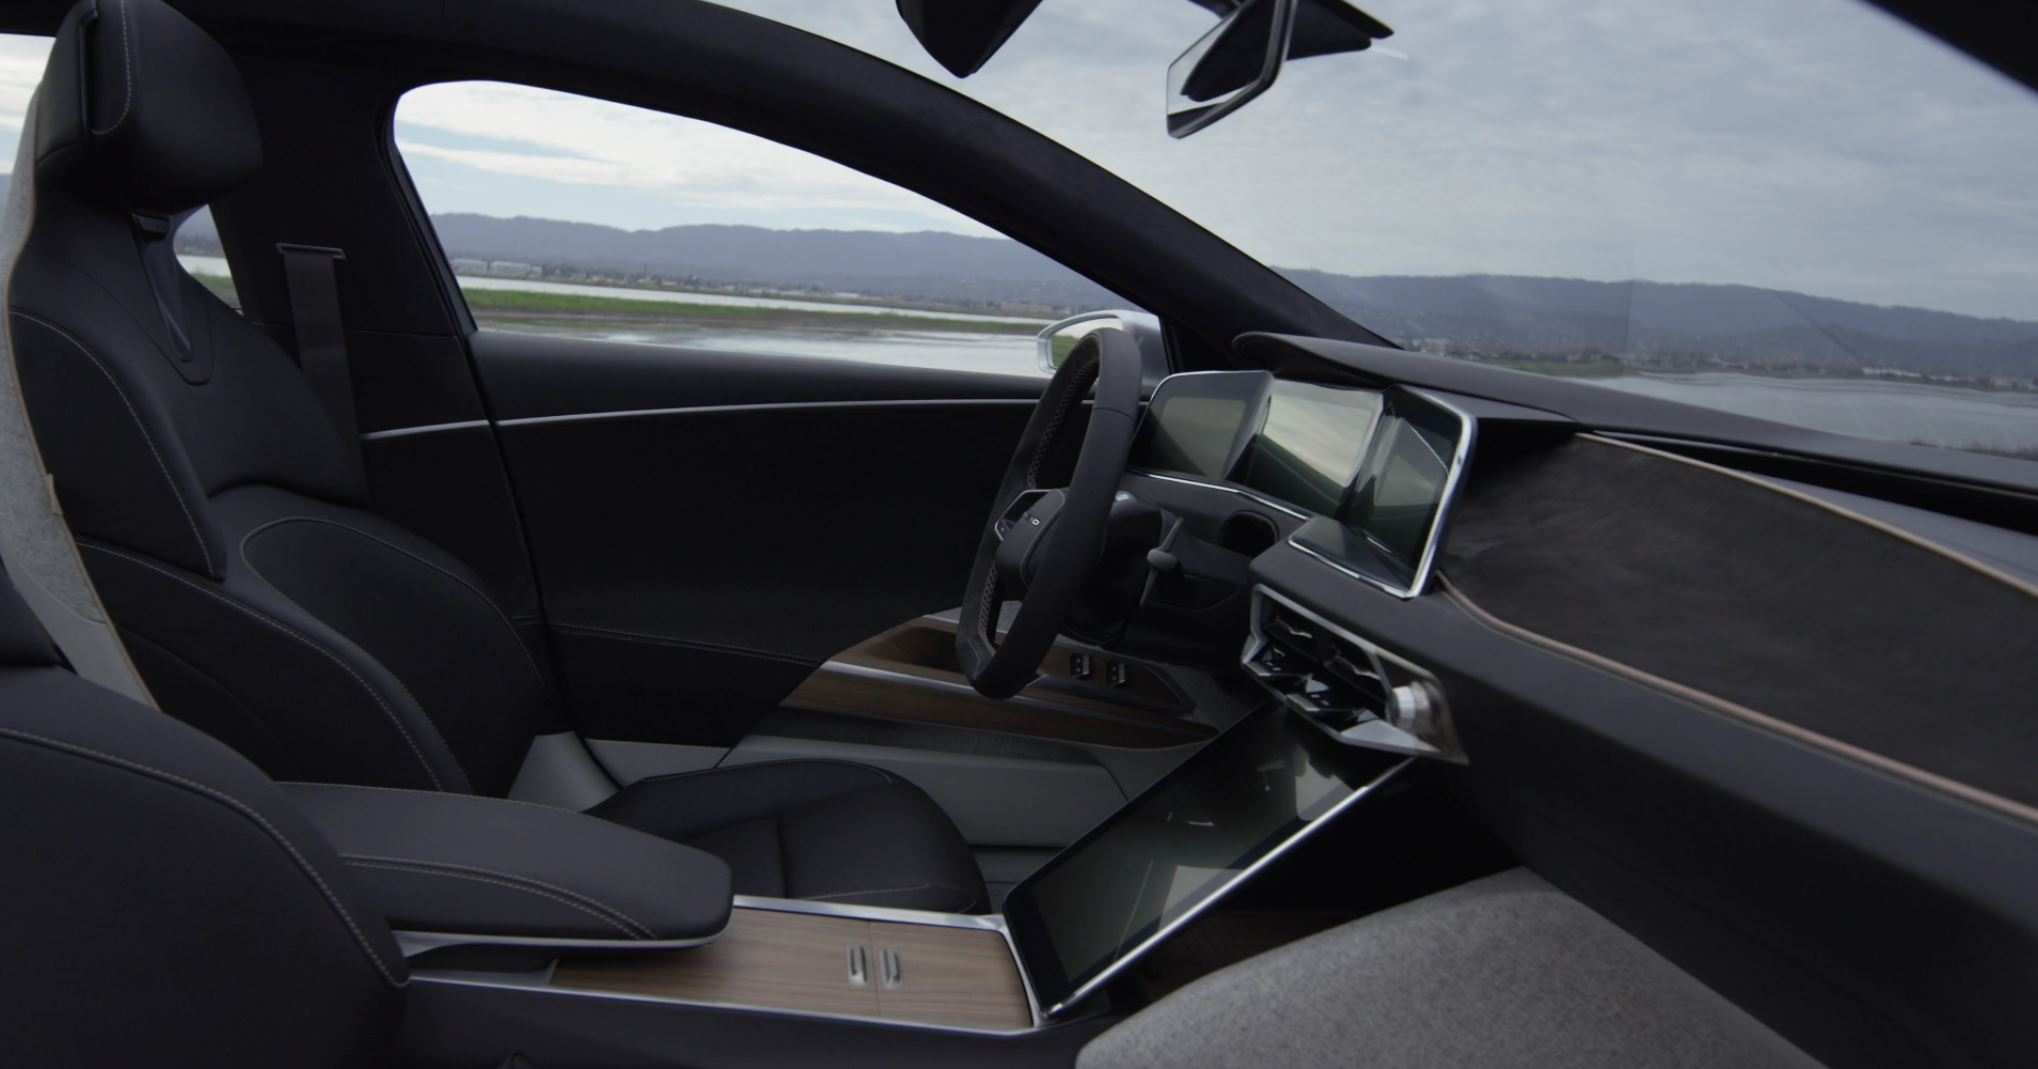 88 Best Review Lucid Air 2019 Tesla Model S Killer Prices with Lucid Air 2019 Tesla Model S Killer